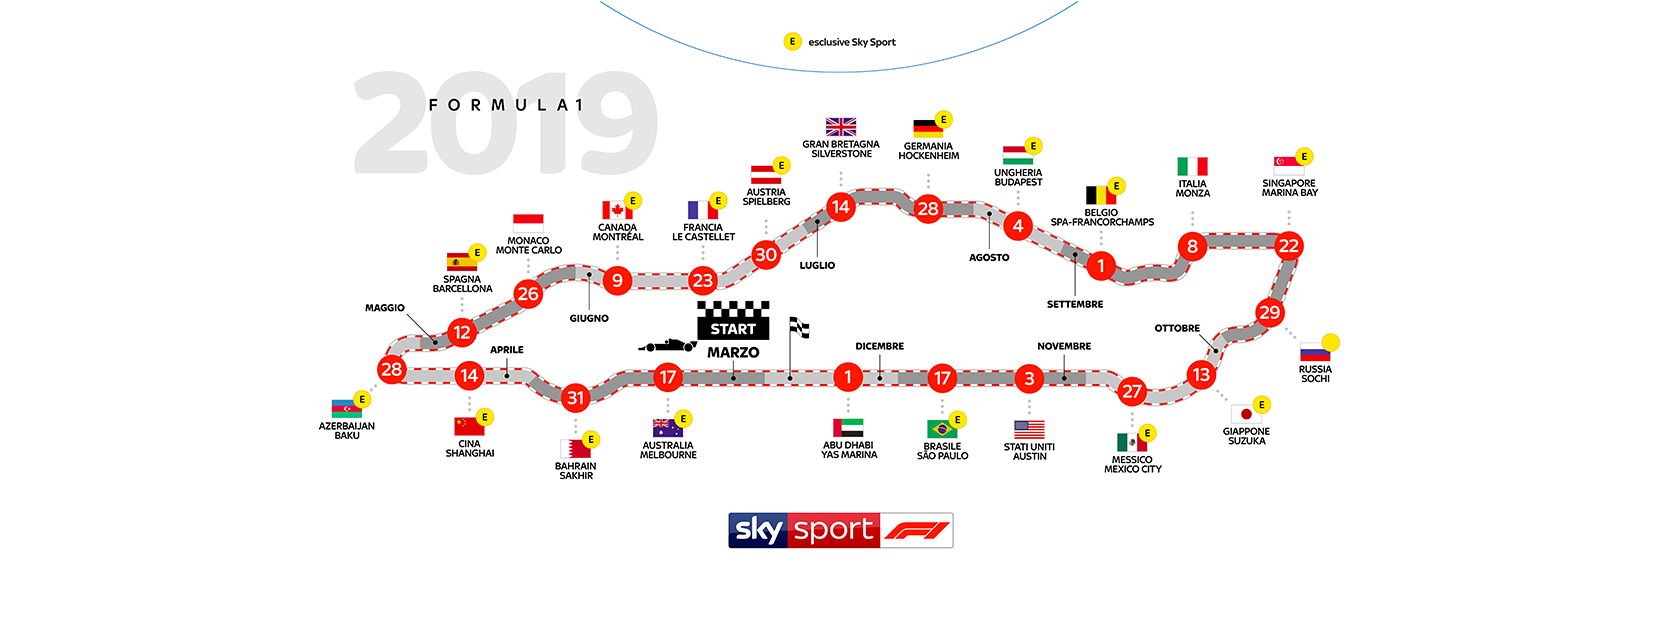 Dirette Tv8 Formula 1